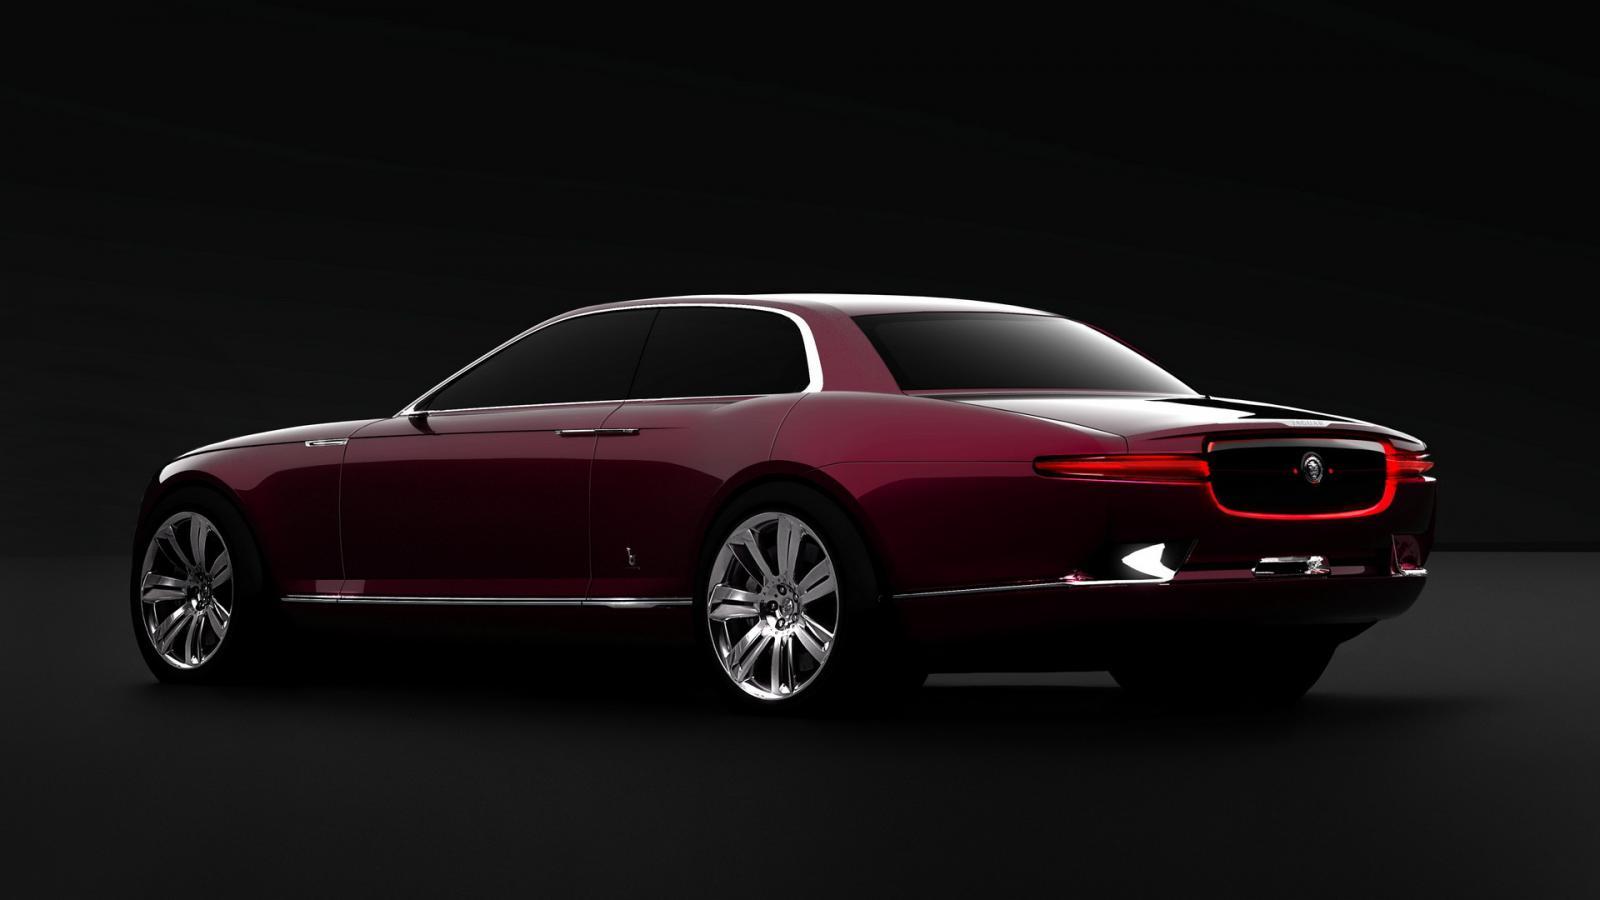 Jaguar B99 Bertone Concept Car Photo Album